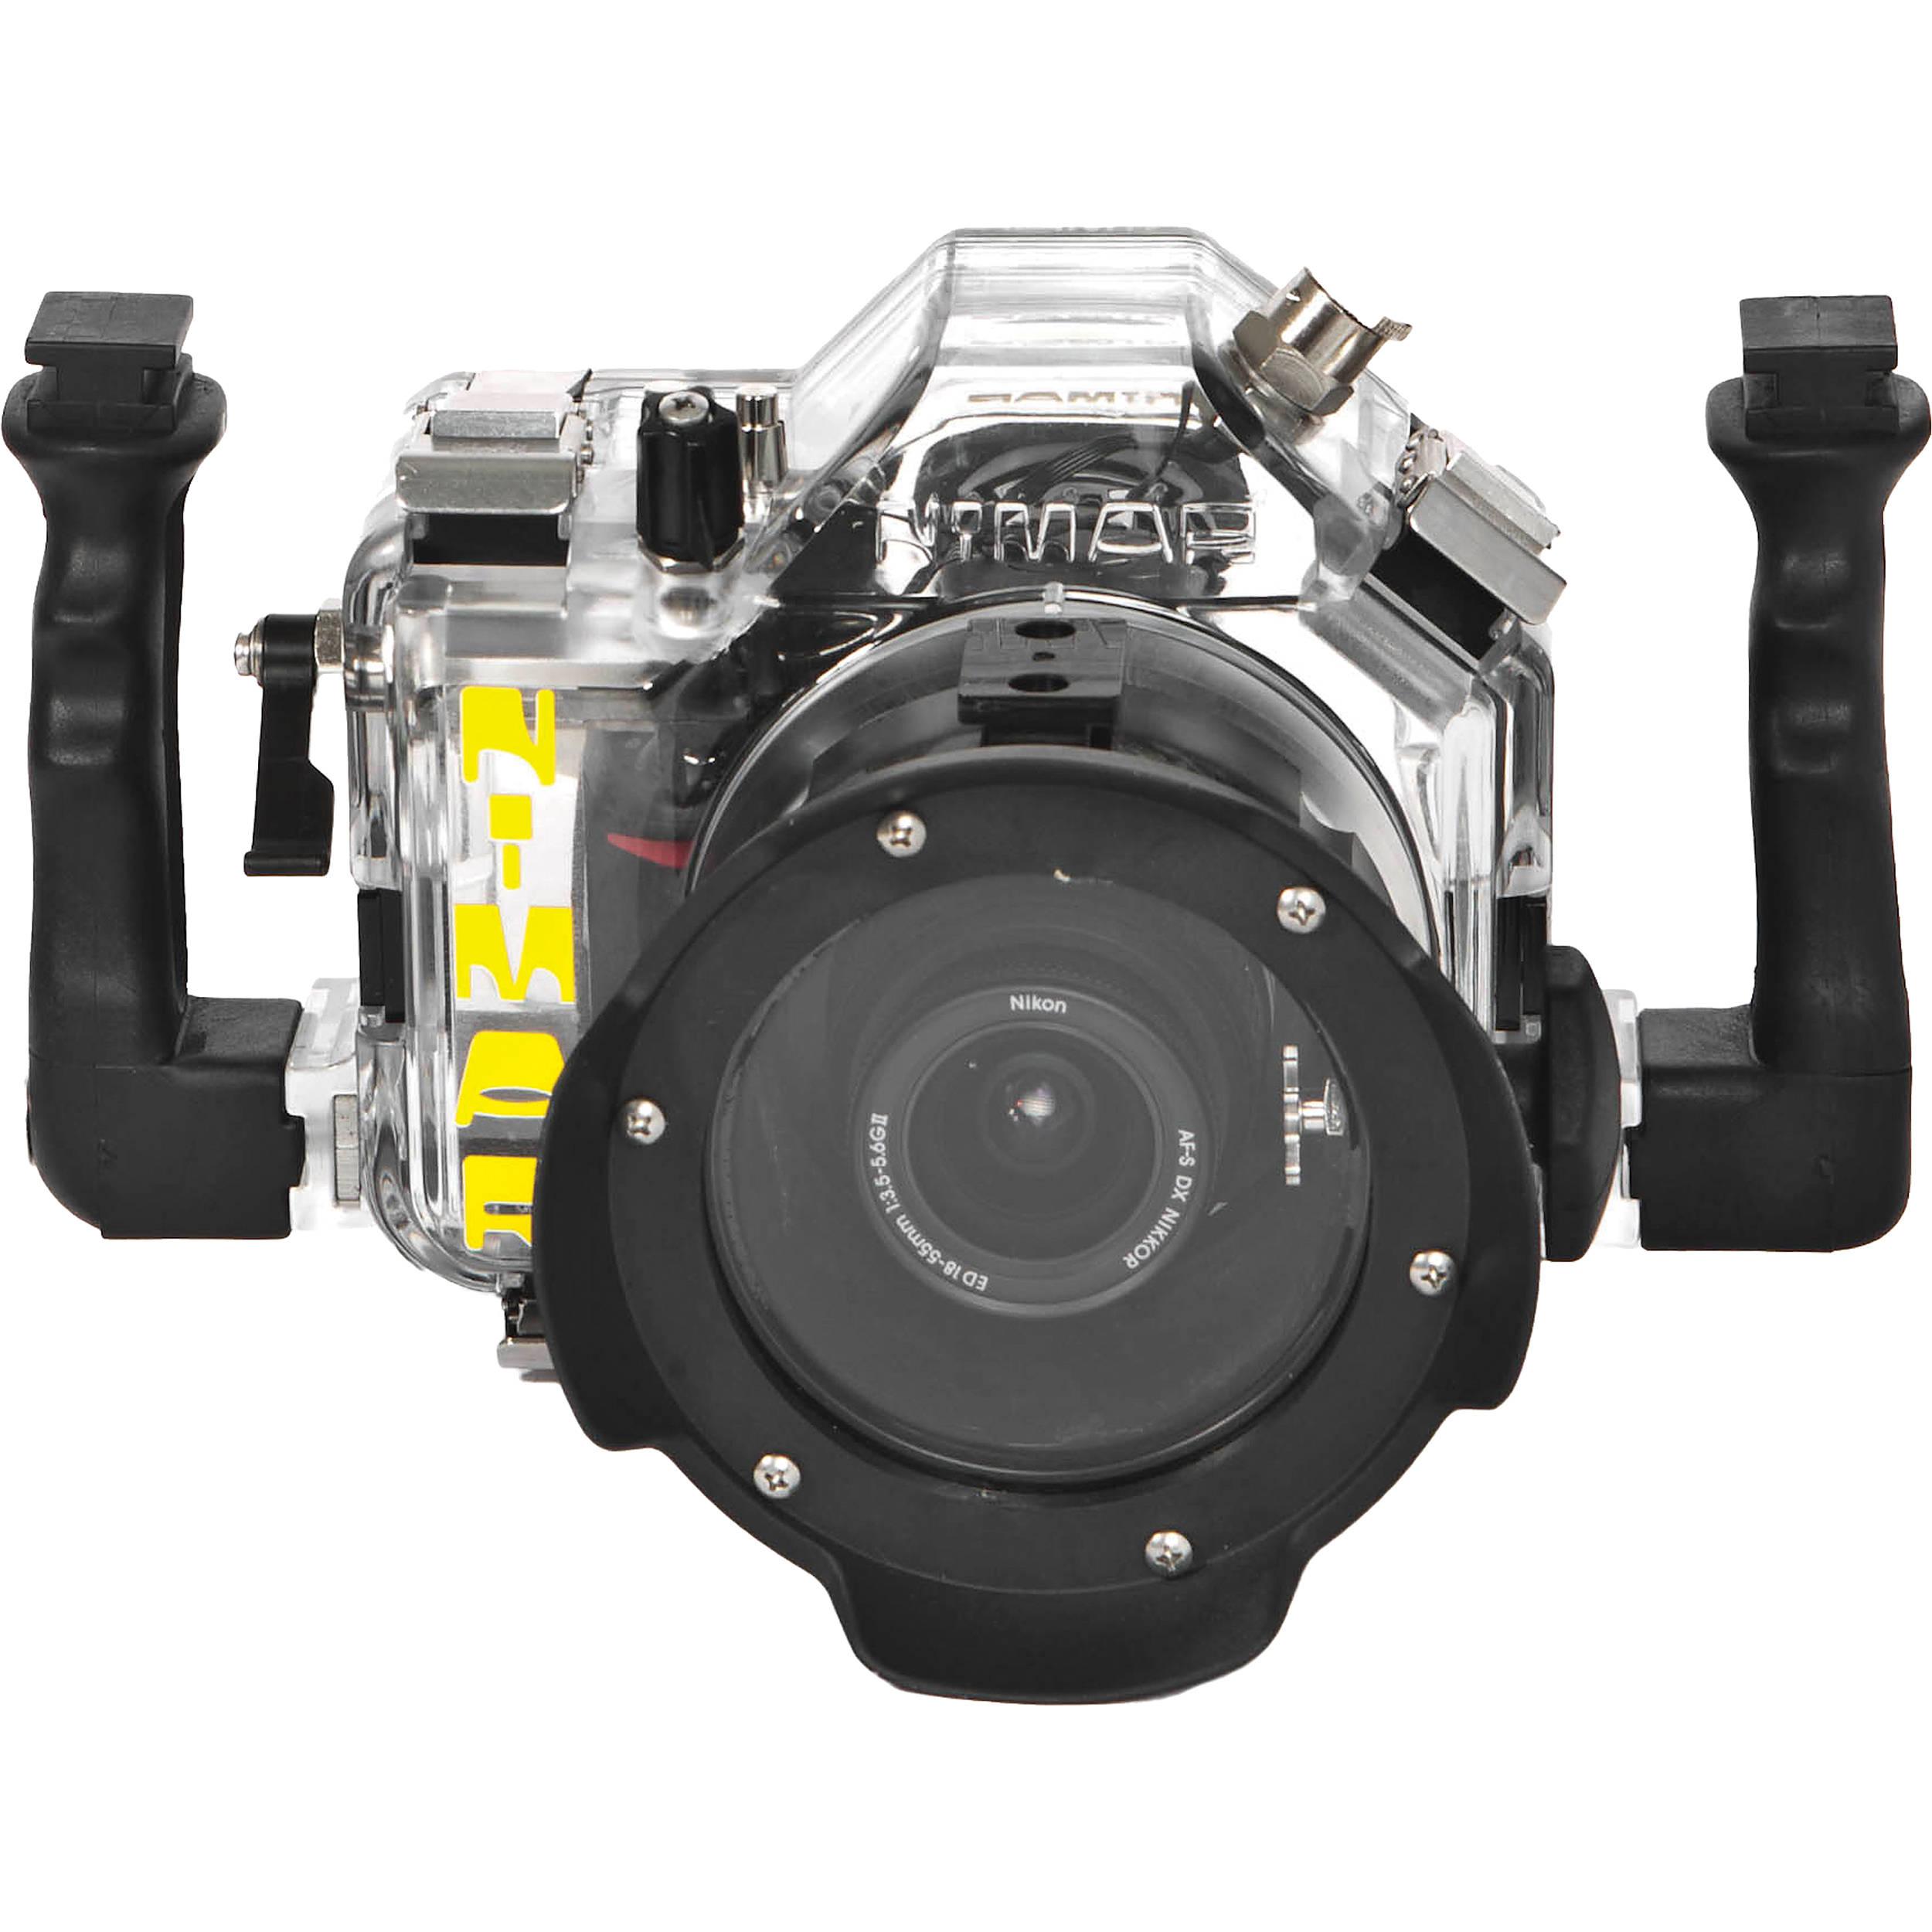 Nimar 3D Underwater Housing for Nikon D3100 with Lens Port for NIKKOR  18-55mm f/3 5-5 6G